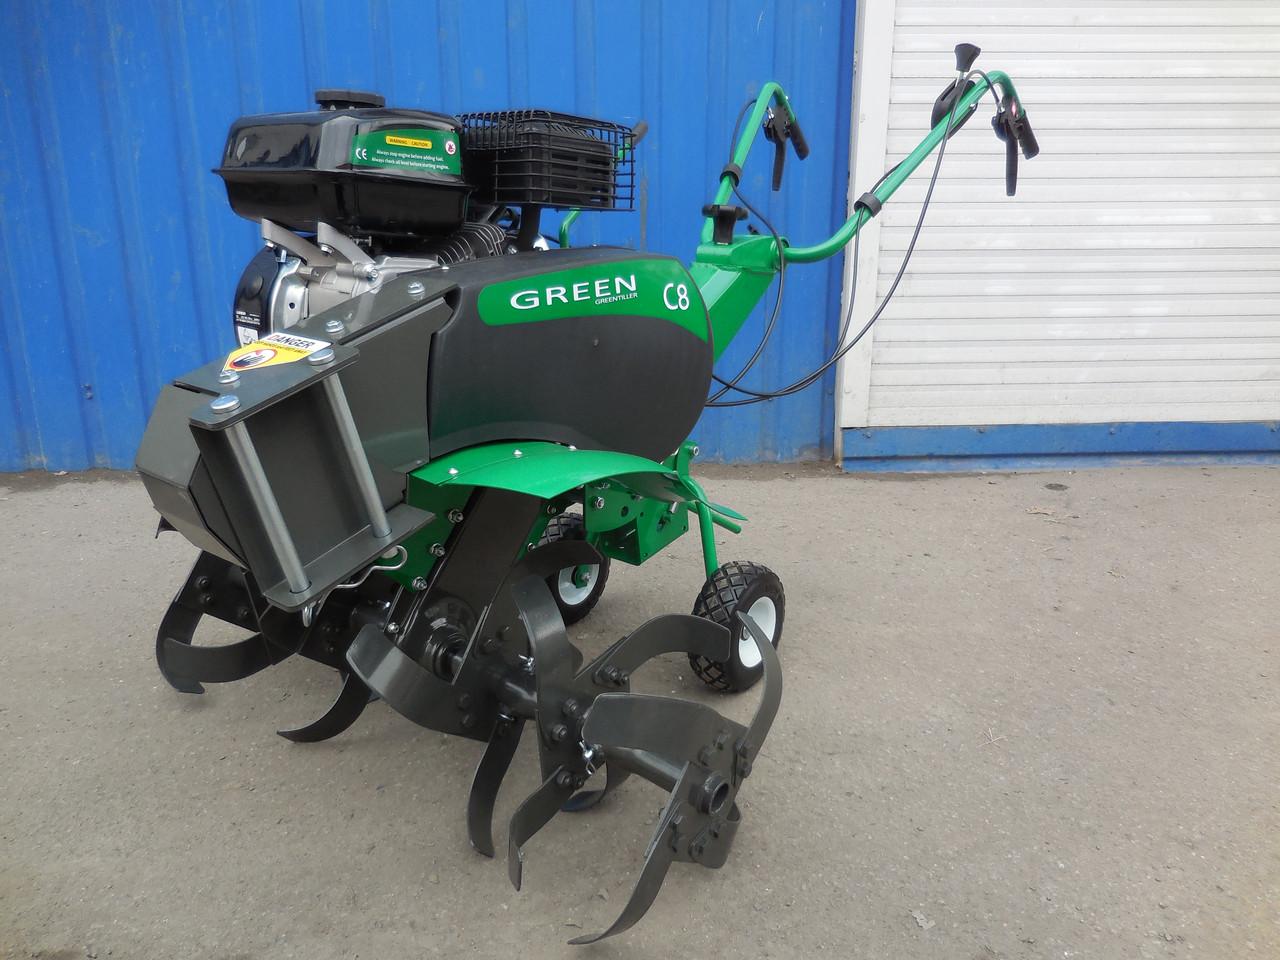 Мотокультиватор GreenTiller С8 (Loncin)